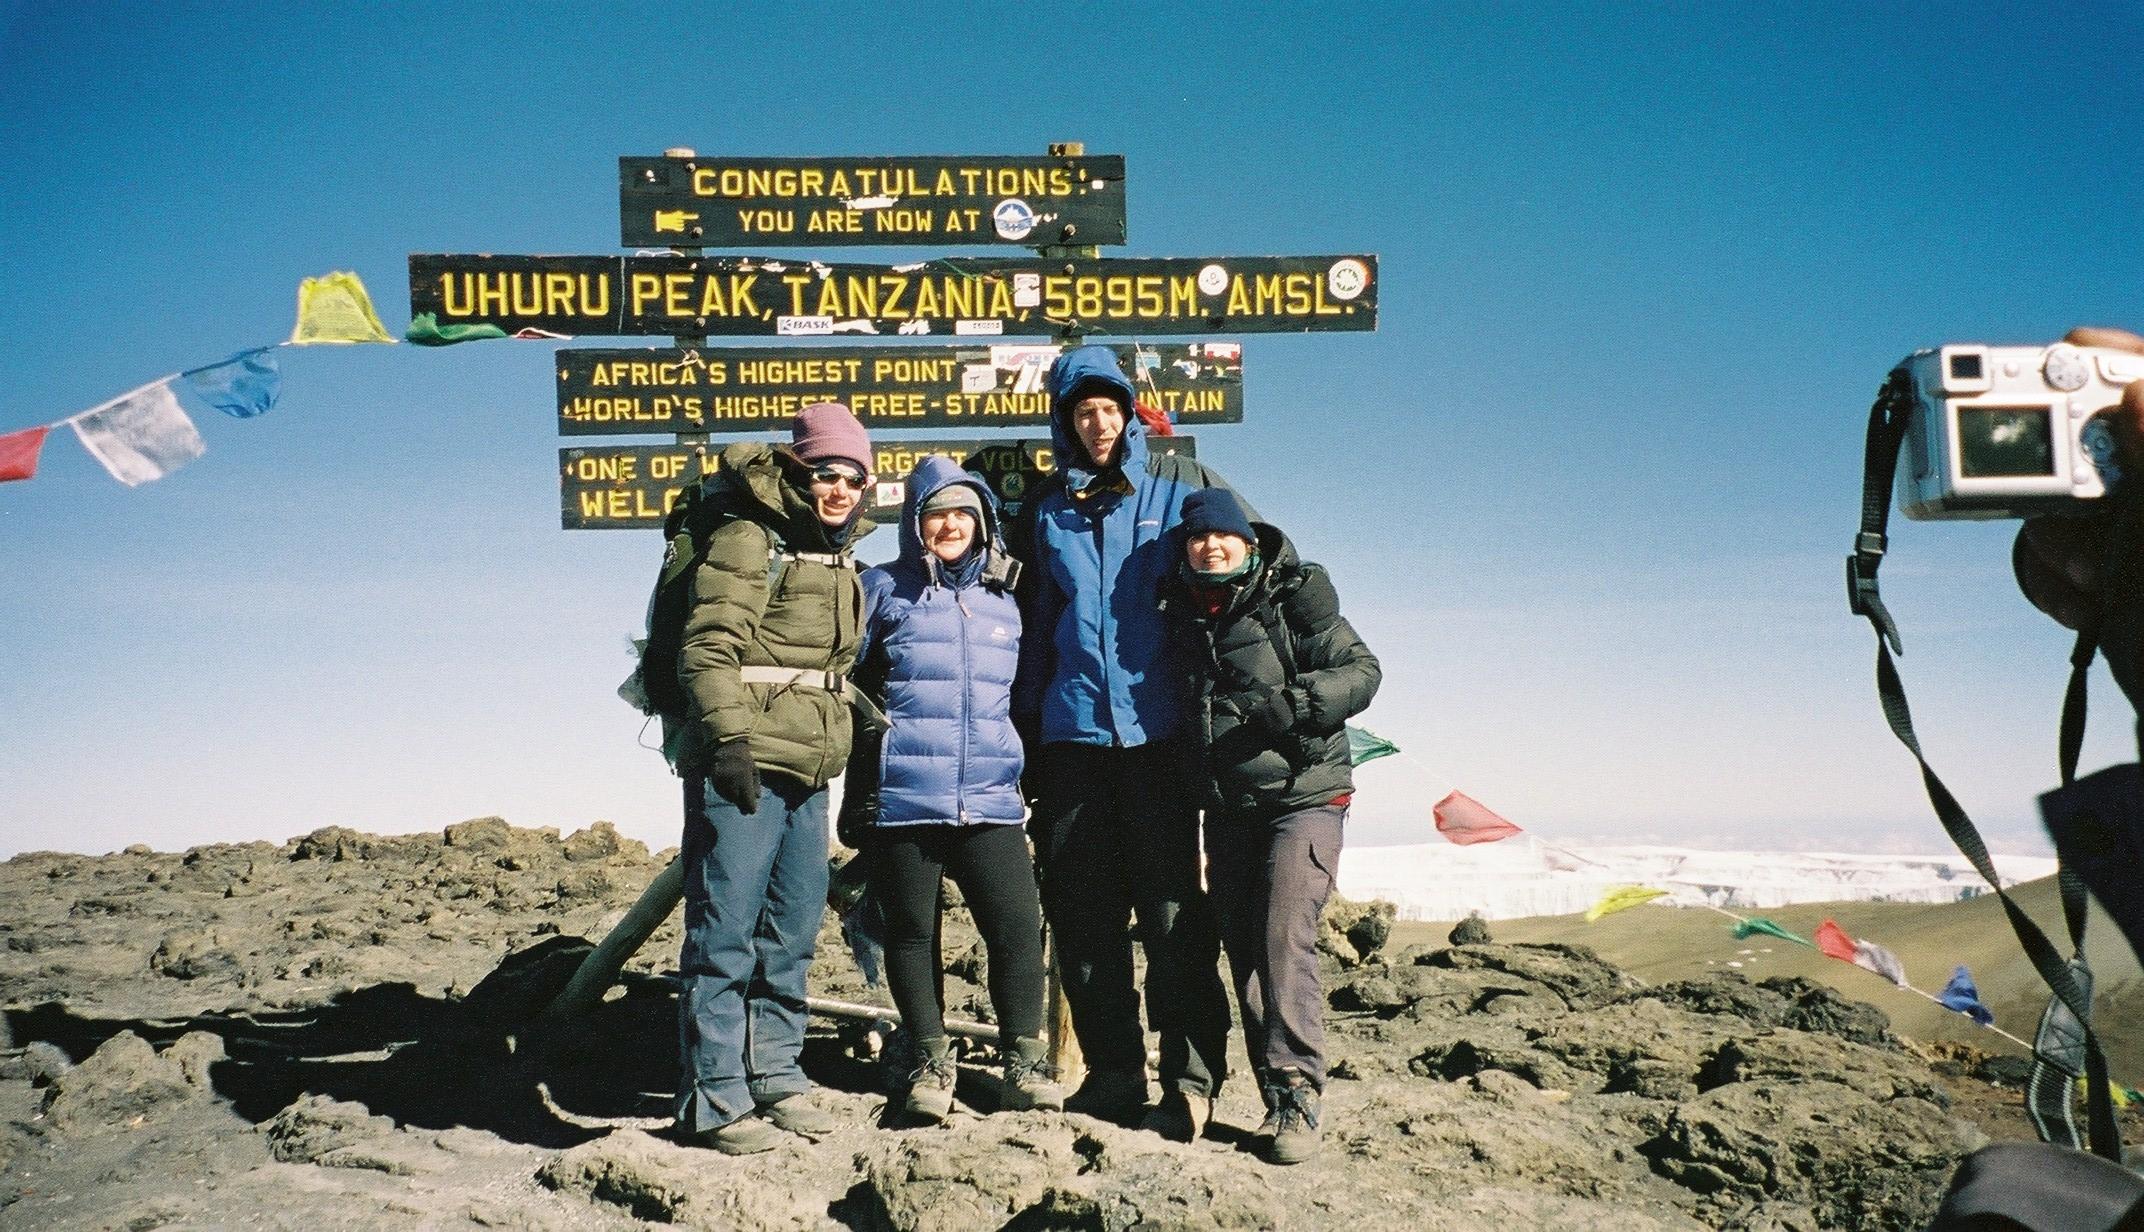 Group at the top of Mount Kilimanjaro